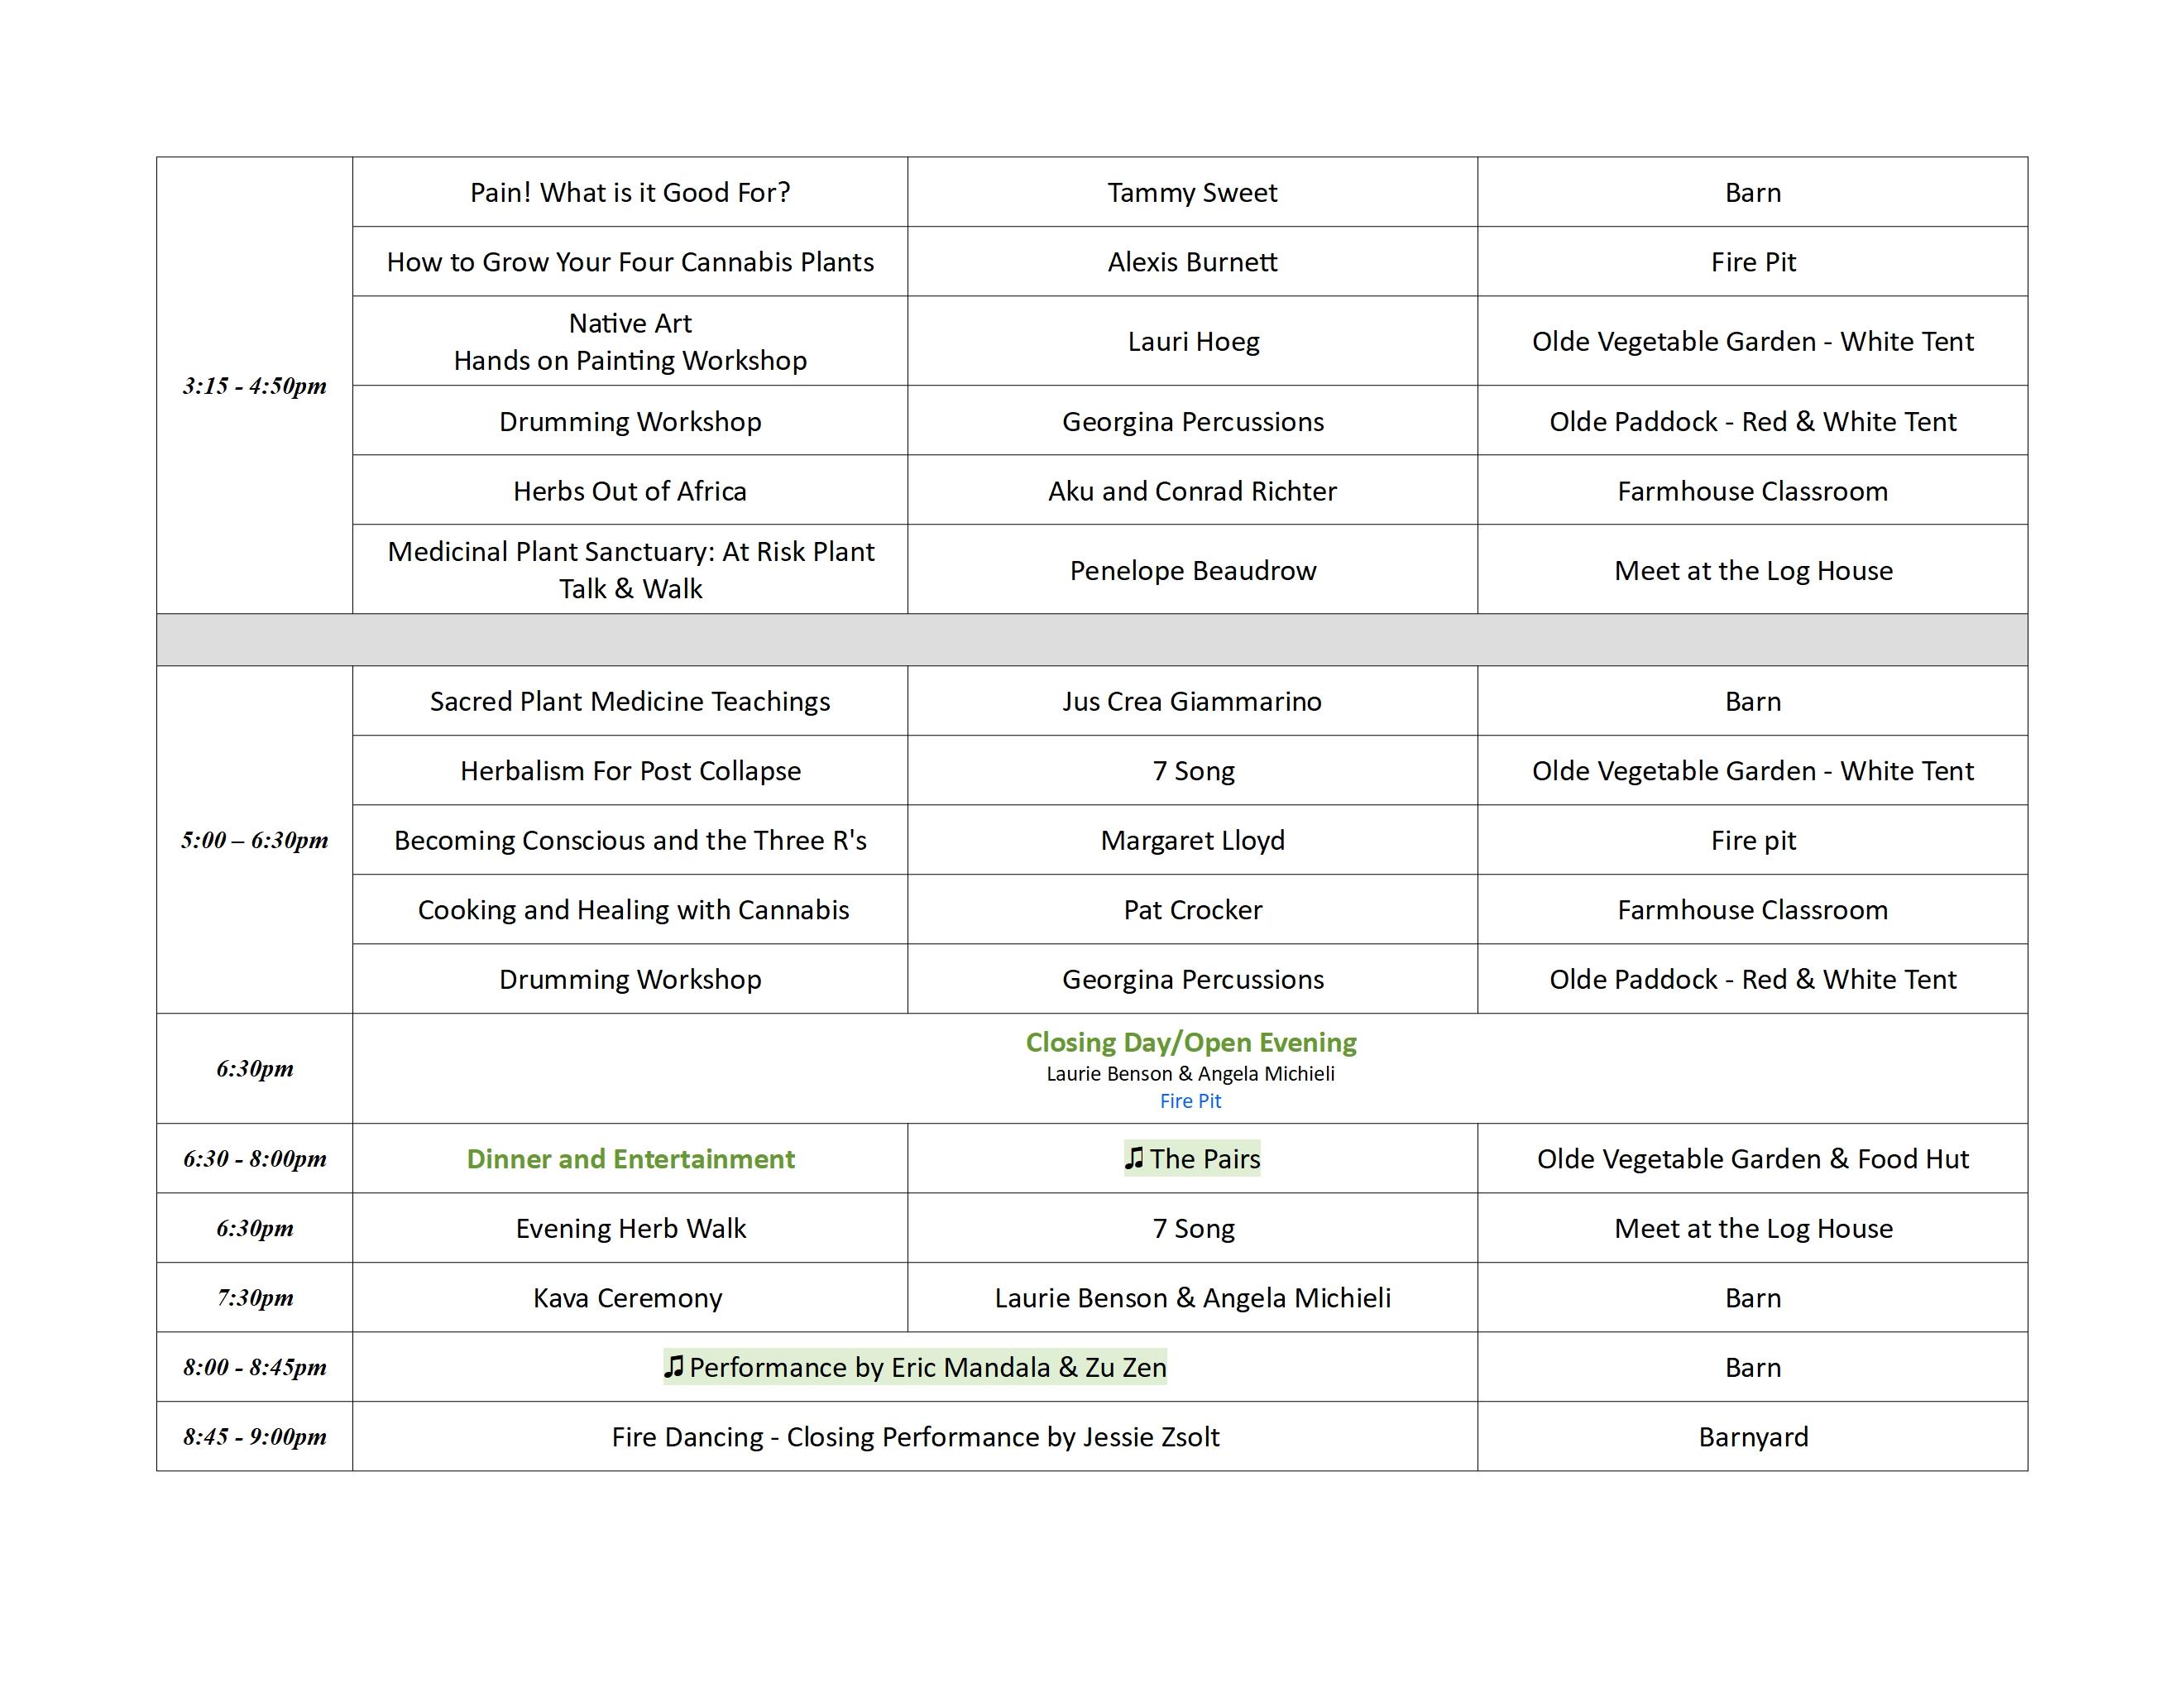 BTYR schedule 2019 July 3 jpg 2